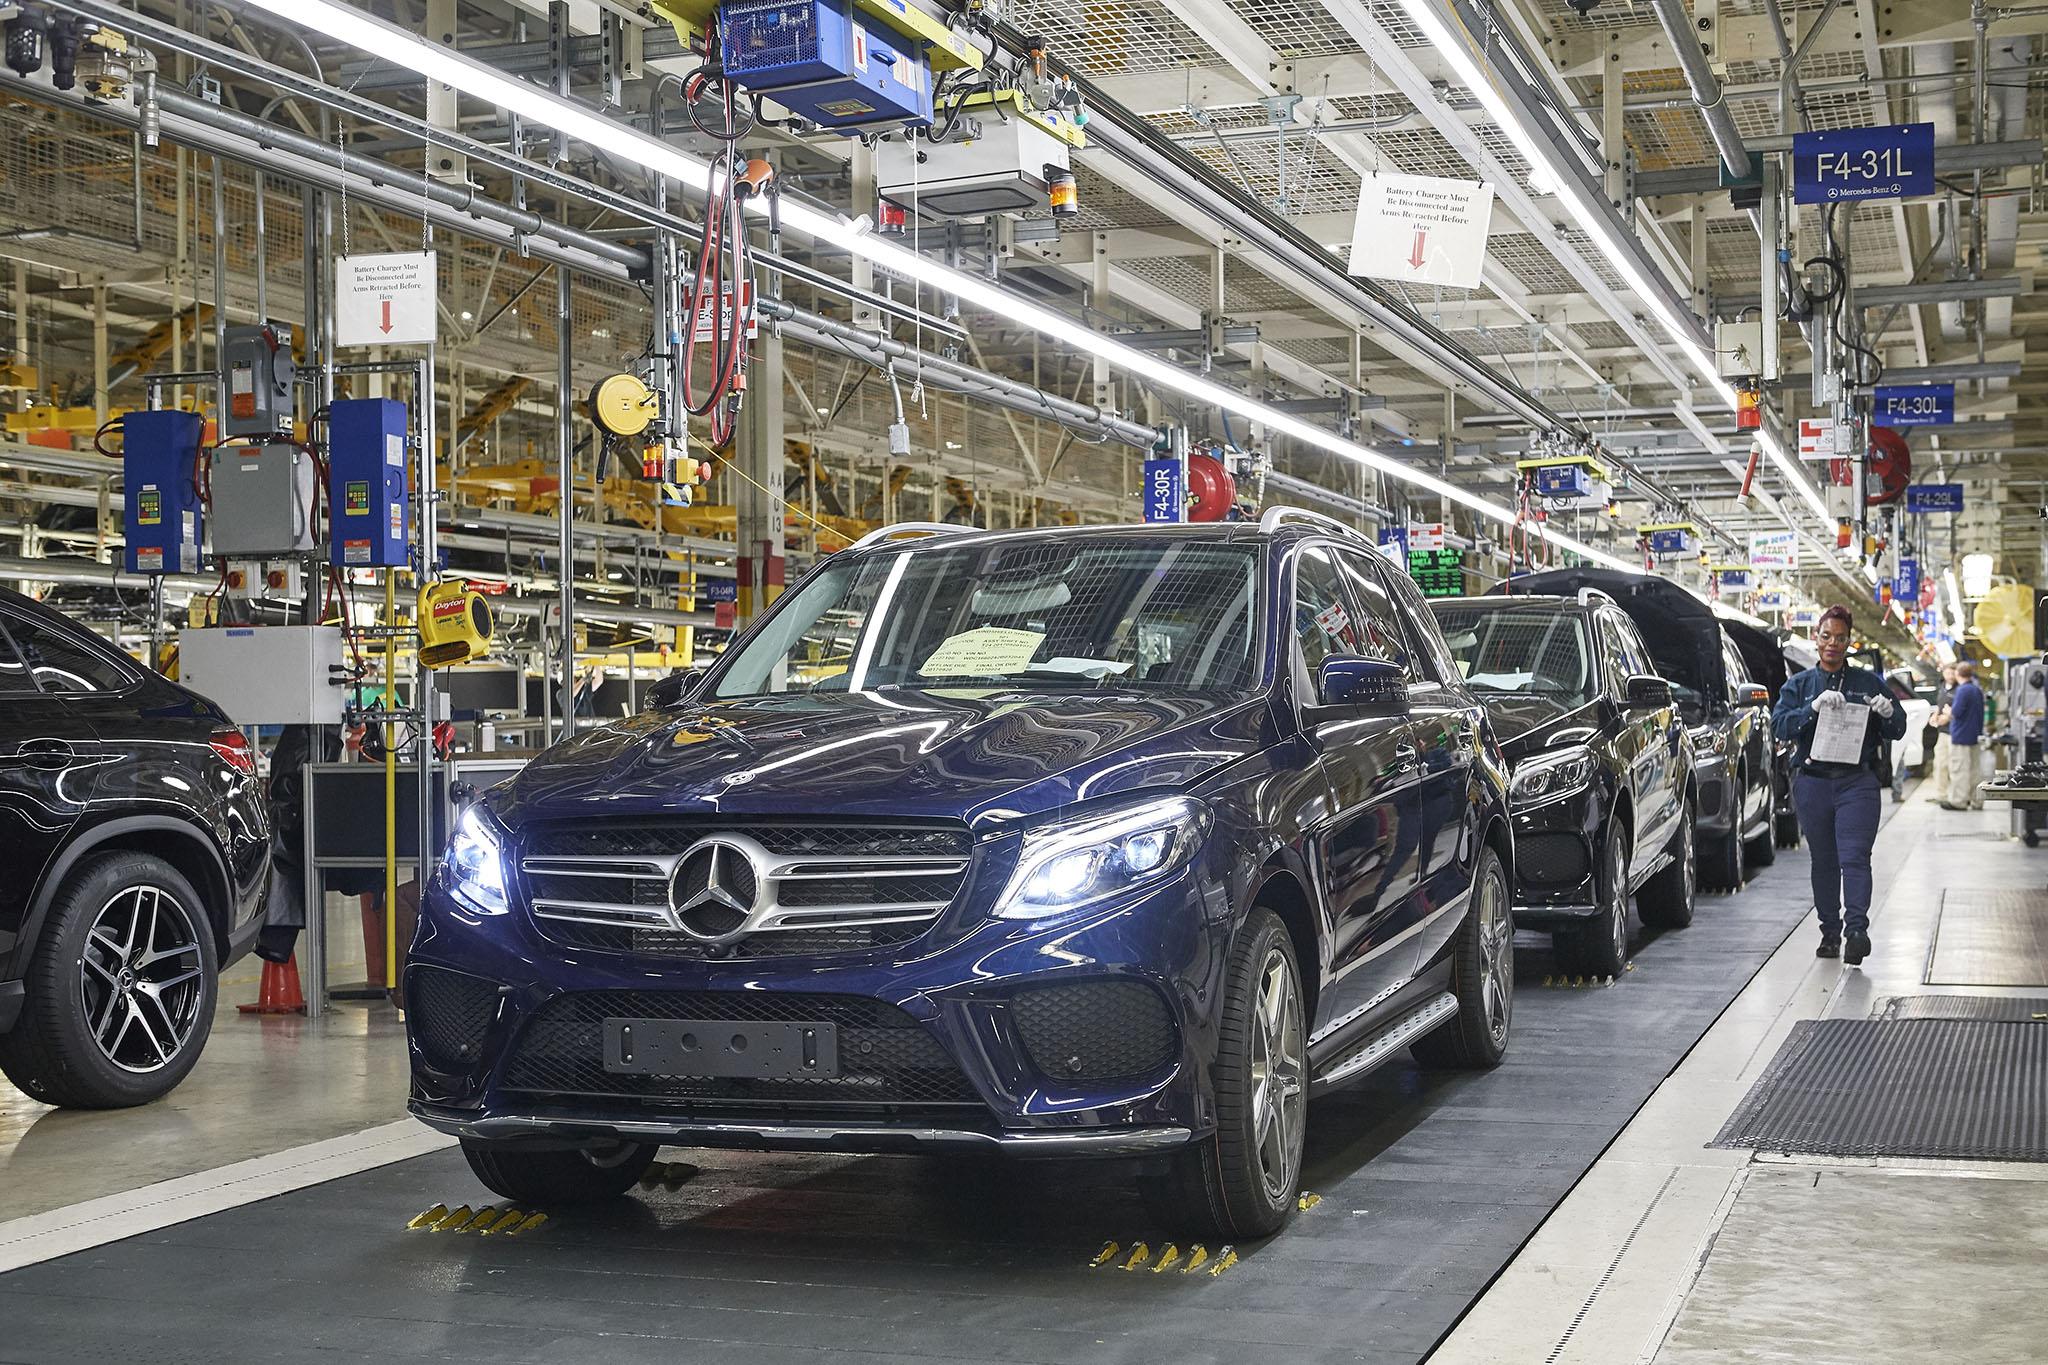 Mercedes Benz Tuscaloosa Plant